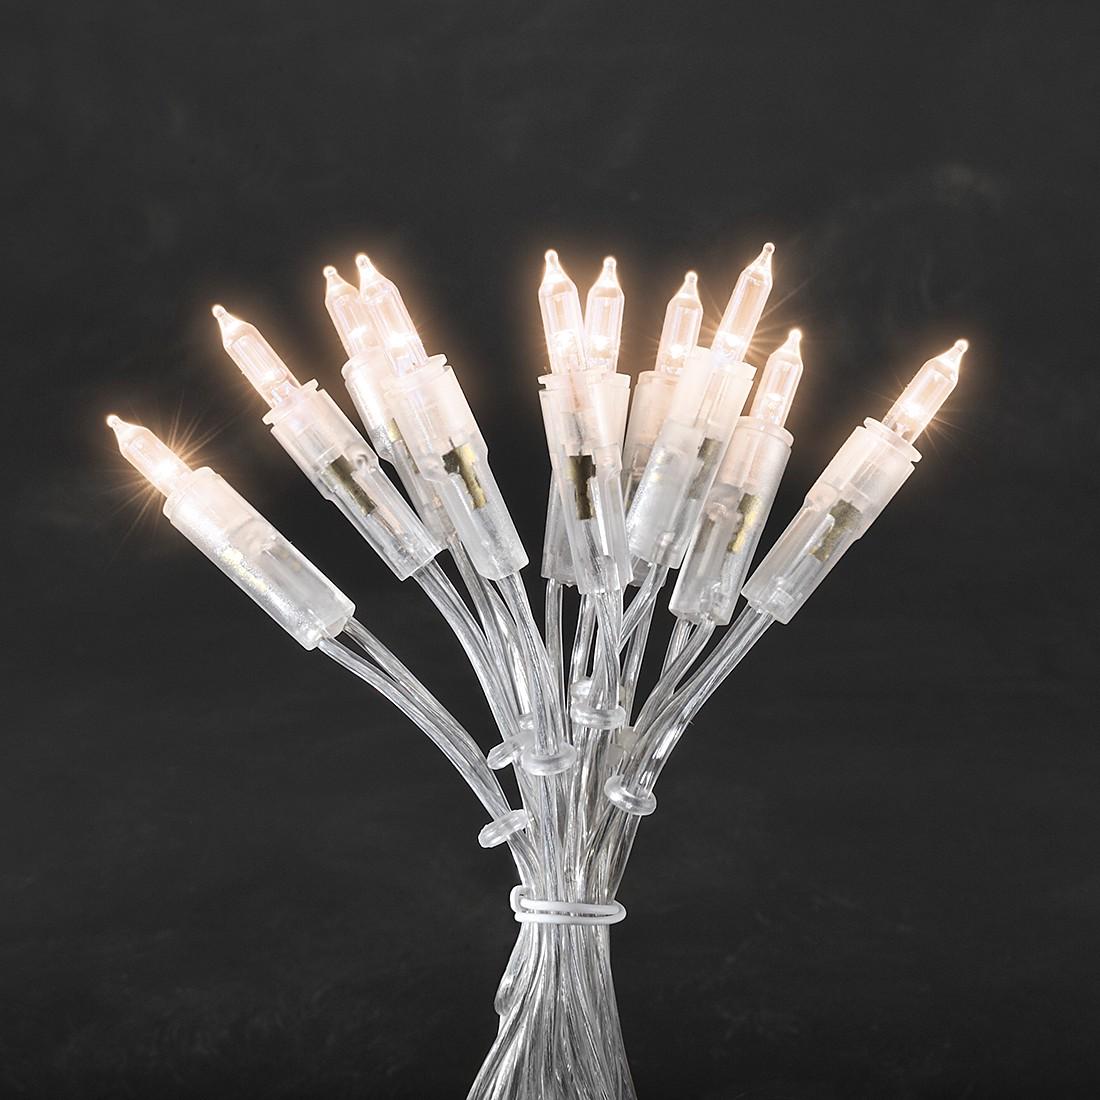 EEK A+, LED Minilichterkette - 50 Weiße Dioden - Innen - transparentes Kabel, Konstsmide